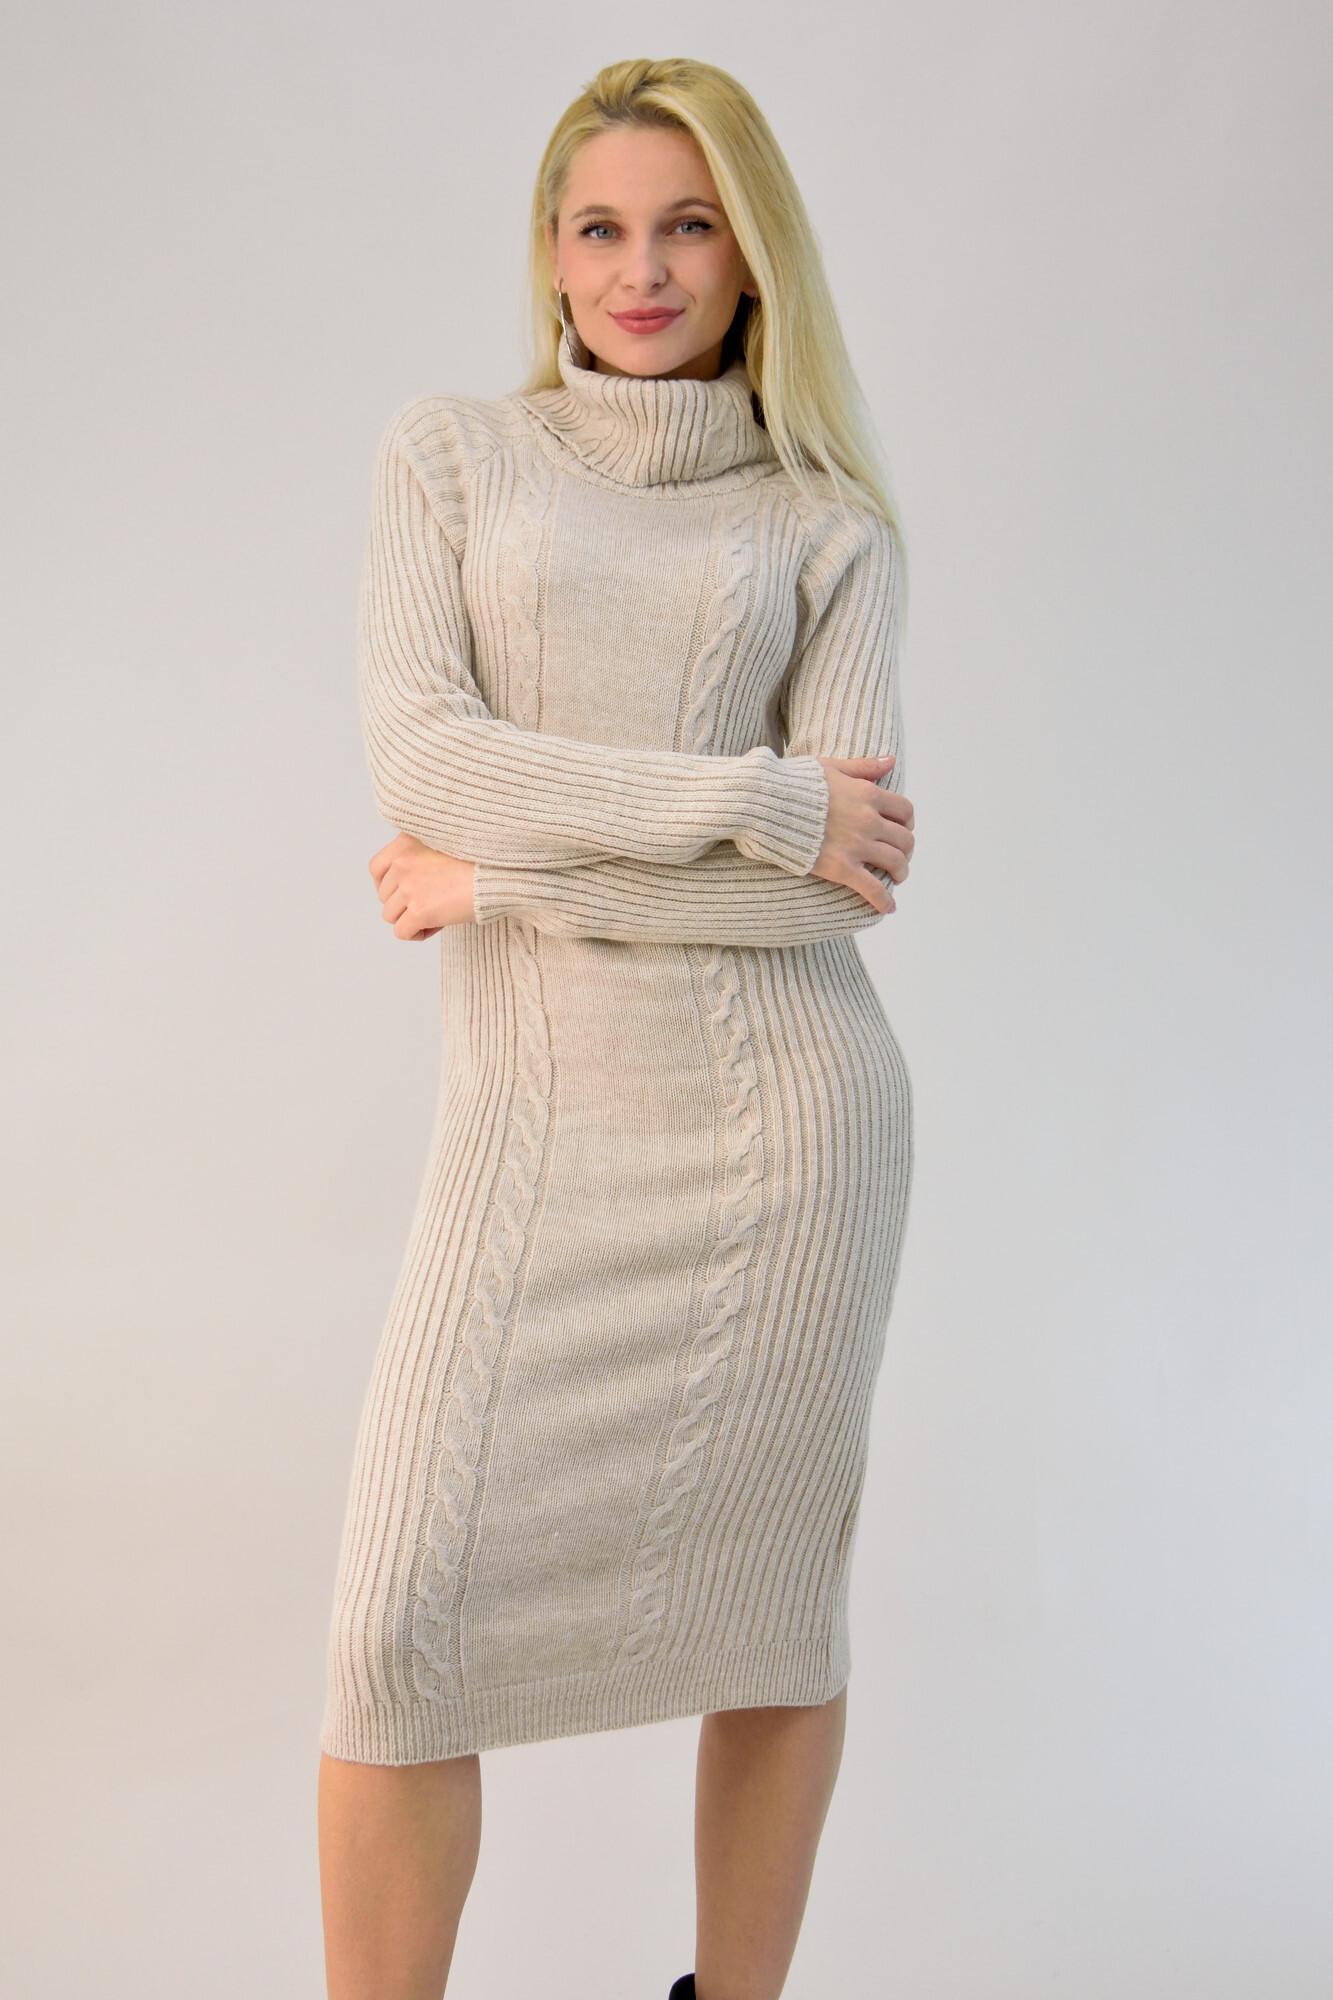 76ae8f2ba02b Midi πλεκτό φόρεμα ζιβάγκο. Tap to expand